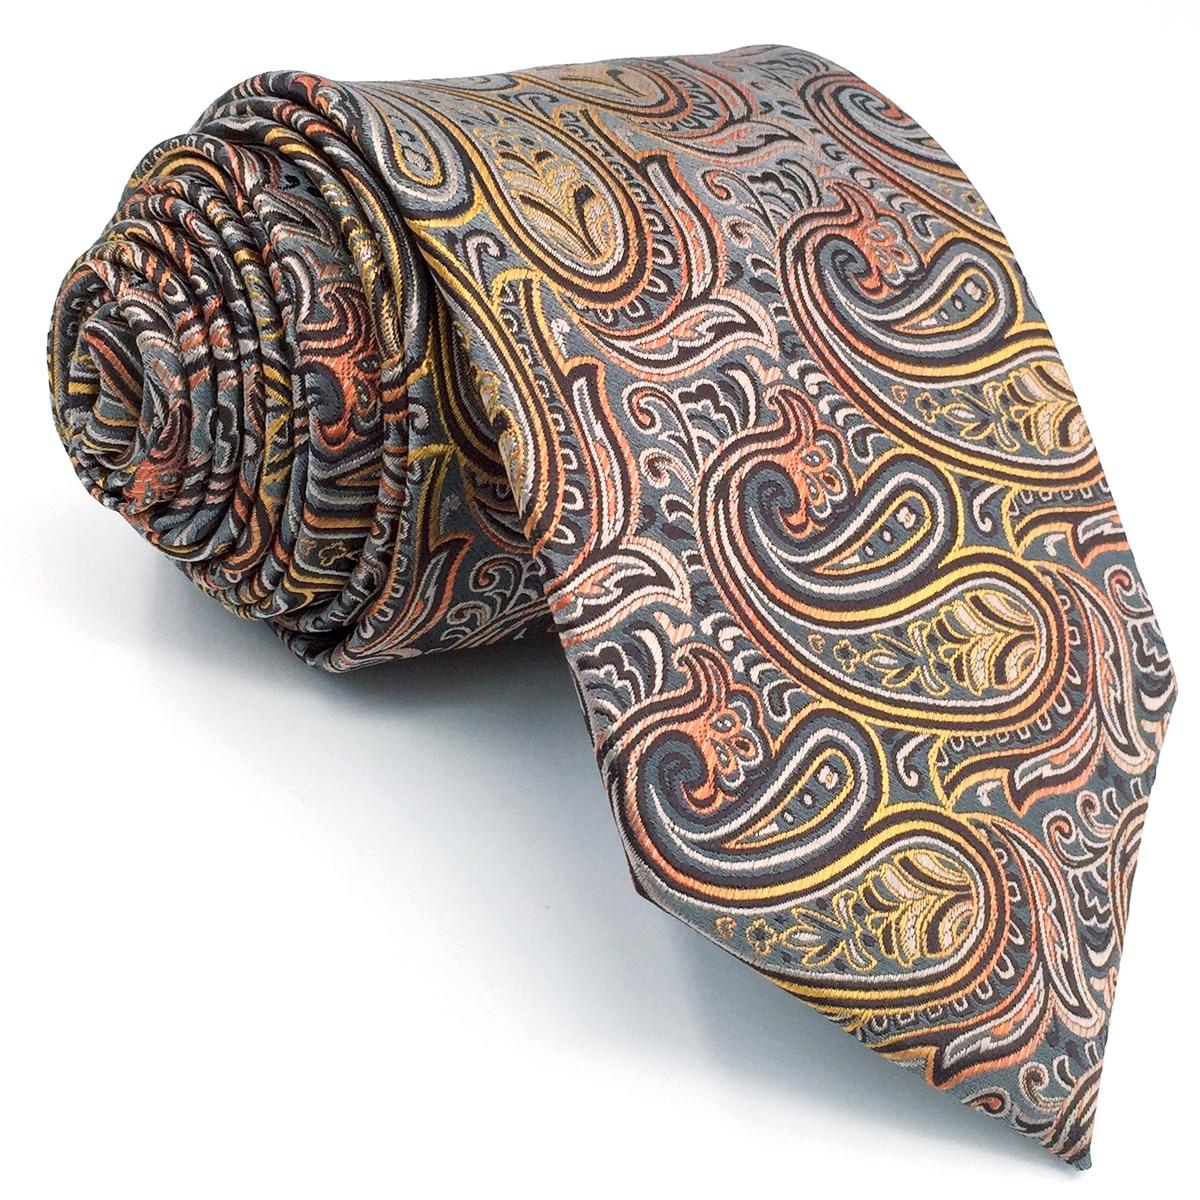 *BRAND NEW* MULTI-COLOR PAISLEY COTTON BROWN MENS BOW TIE/&POCKET SQUARE SET B879